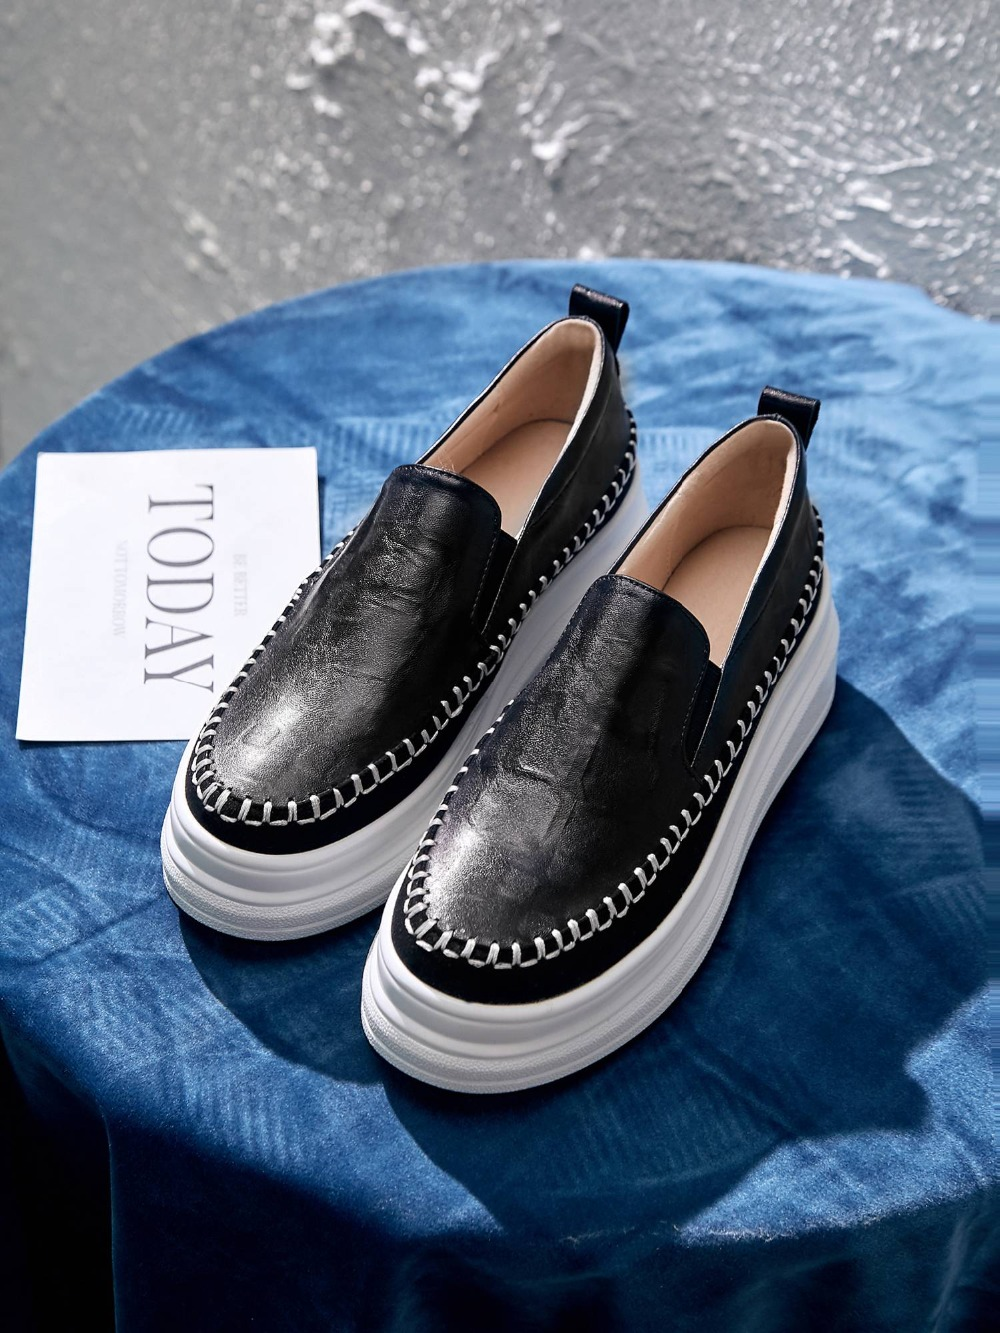 Krazing หม้อหรูหราแกะหนัง loafers toe toe ผสมสี British school ๆรองเท้า vulcanized รองเท้า L03-ใน รองเท้ายางวัลคาไนซ์สำหรับสตรี จาก รองเท้า บน   2